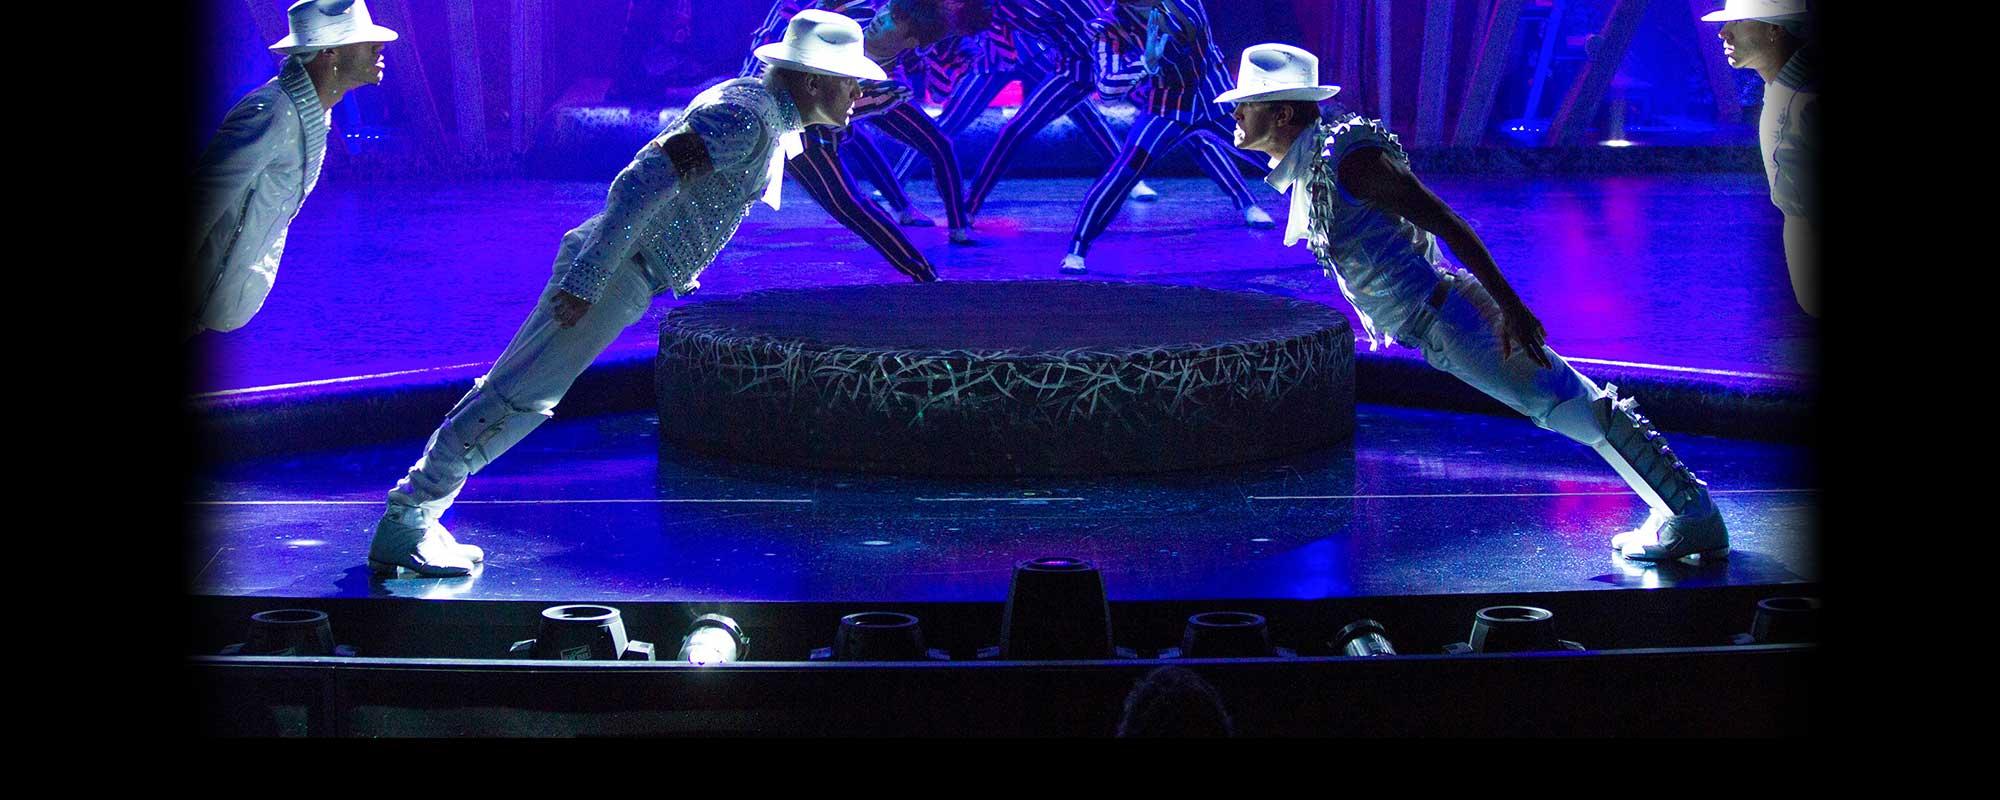 Michael Jackson ONE by Cirque du Soleil show